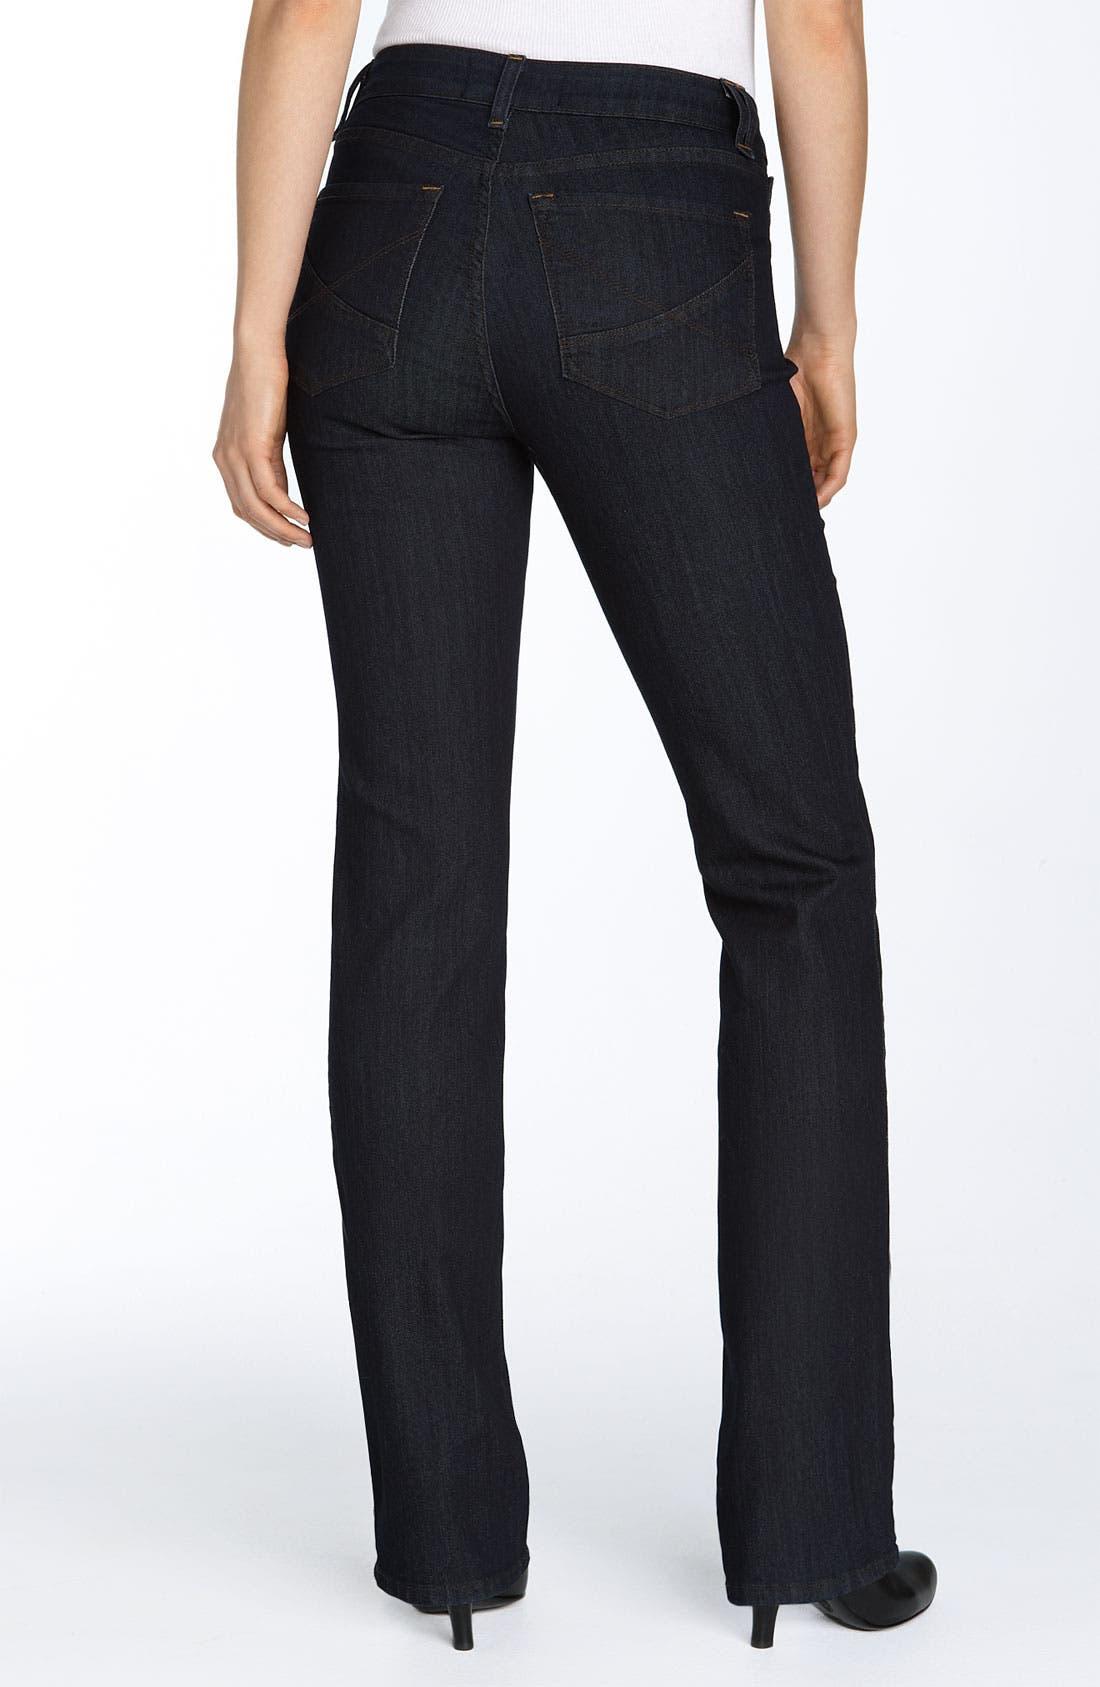 Marilyn Stretch Straight Leg Jeans,                             Alternate thumbnail 2, color,